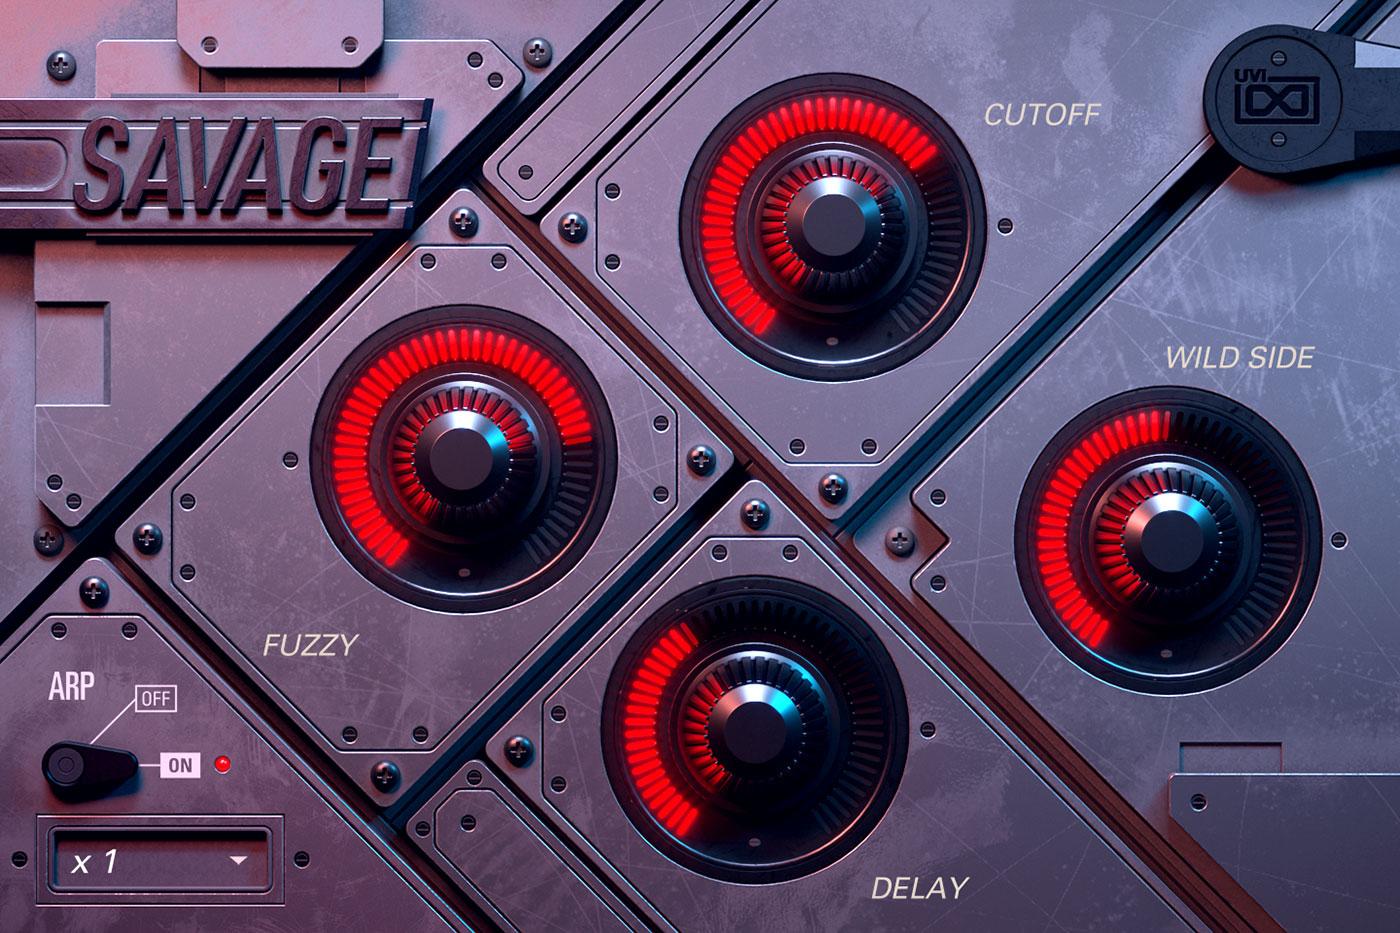 GUI_Savage_01_Arpeggiated